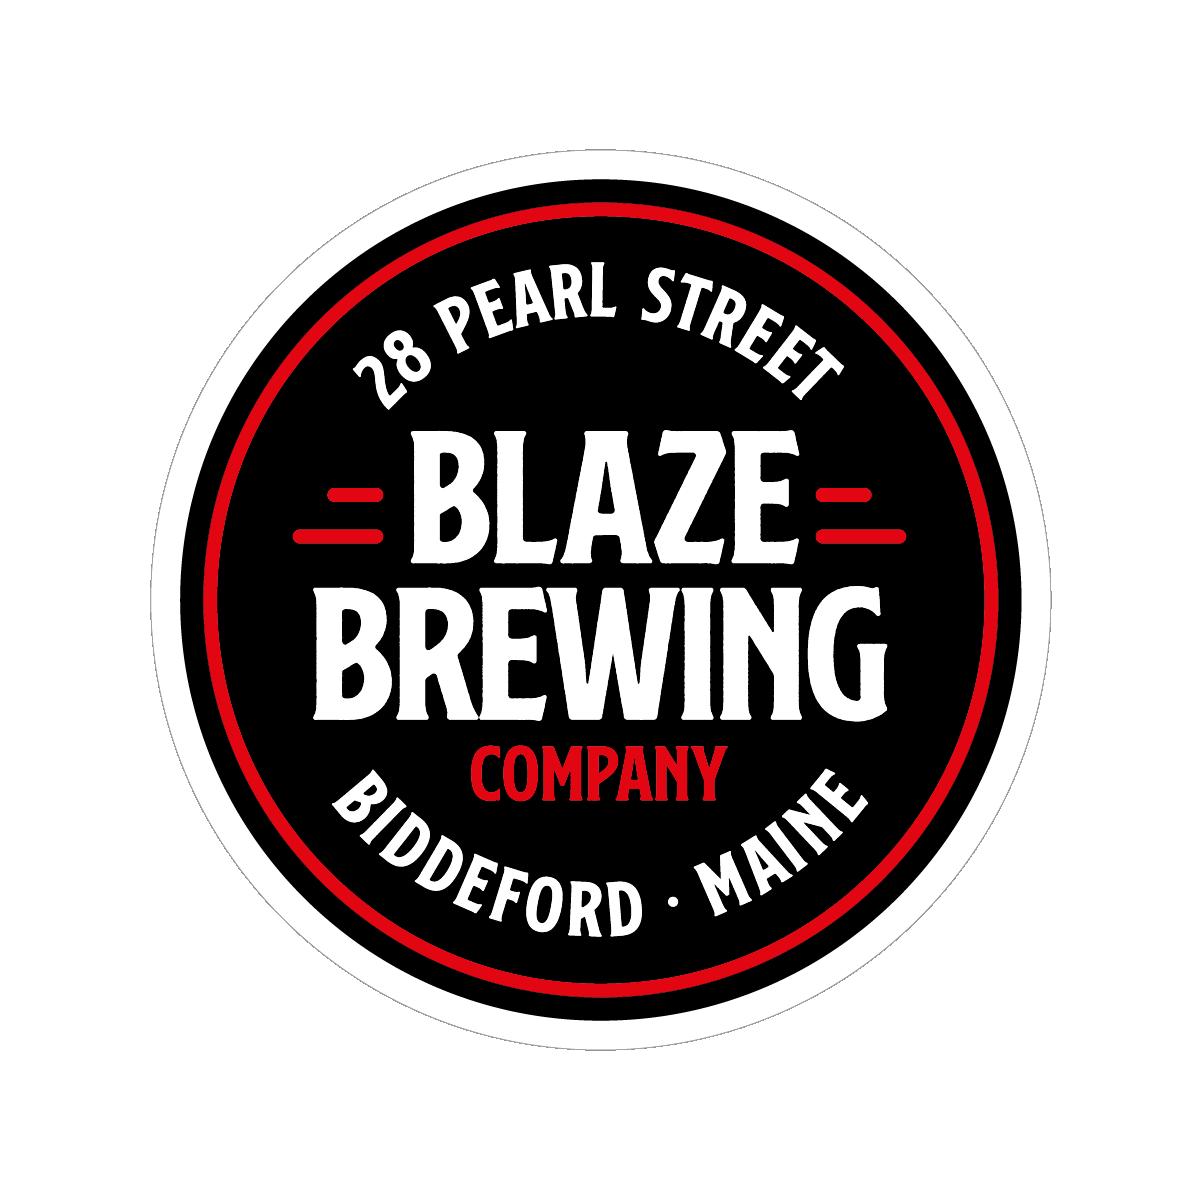 Blaze Brewing Co.